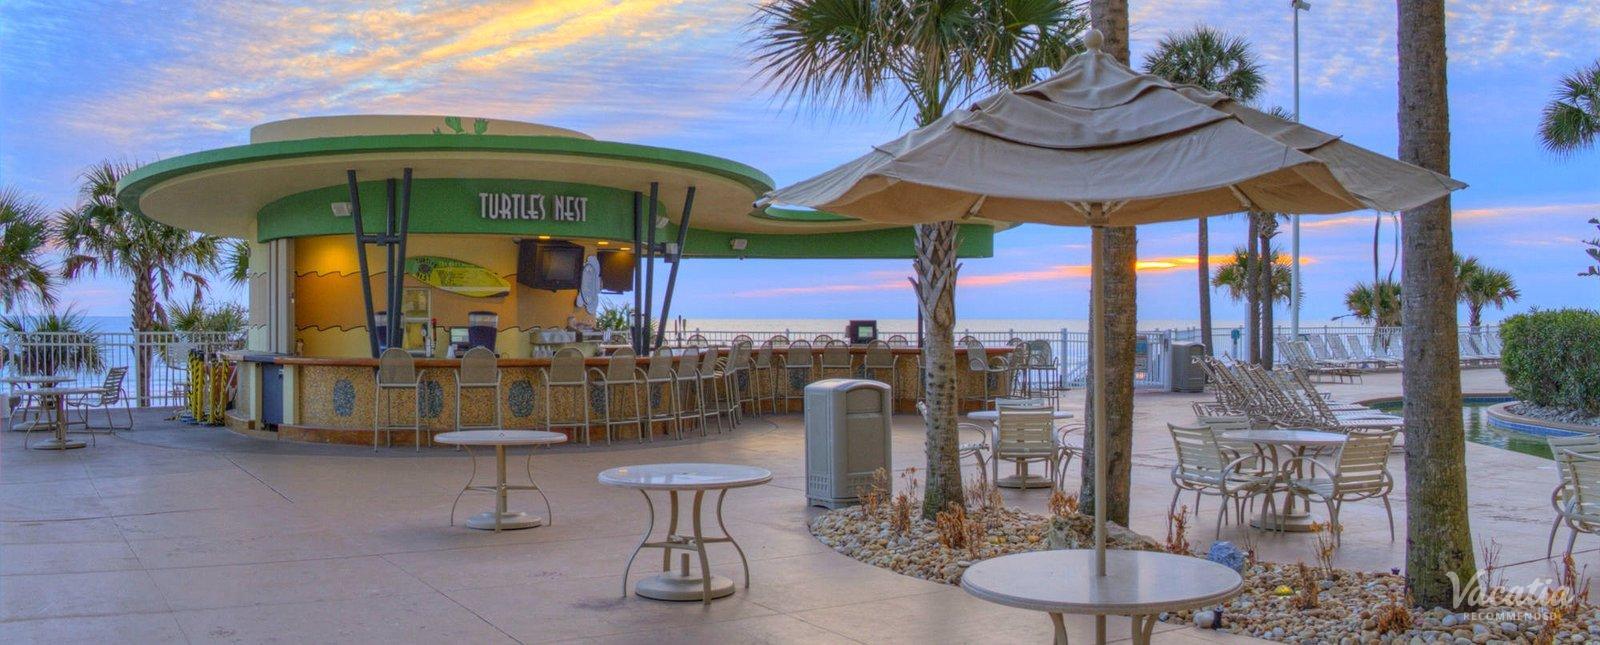 Wyndham ocean walk daytona beach fl vacatia 3 bedroom suites in daytona beach fl